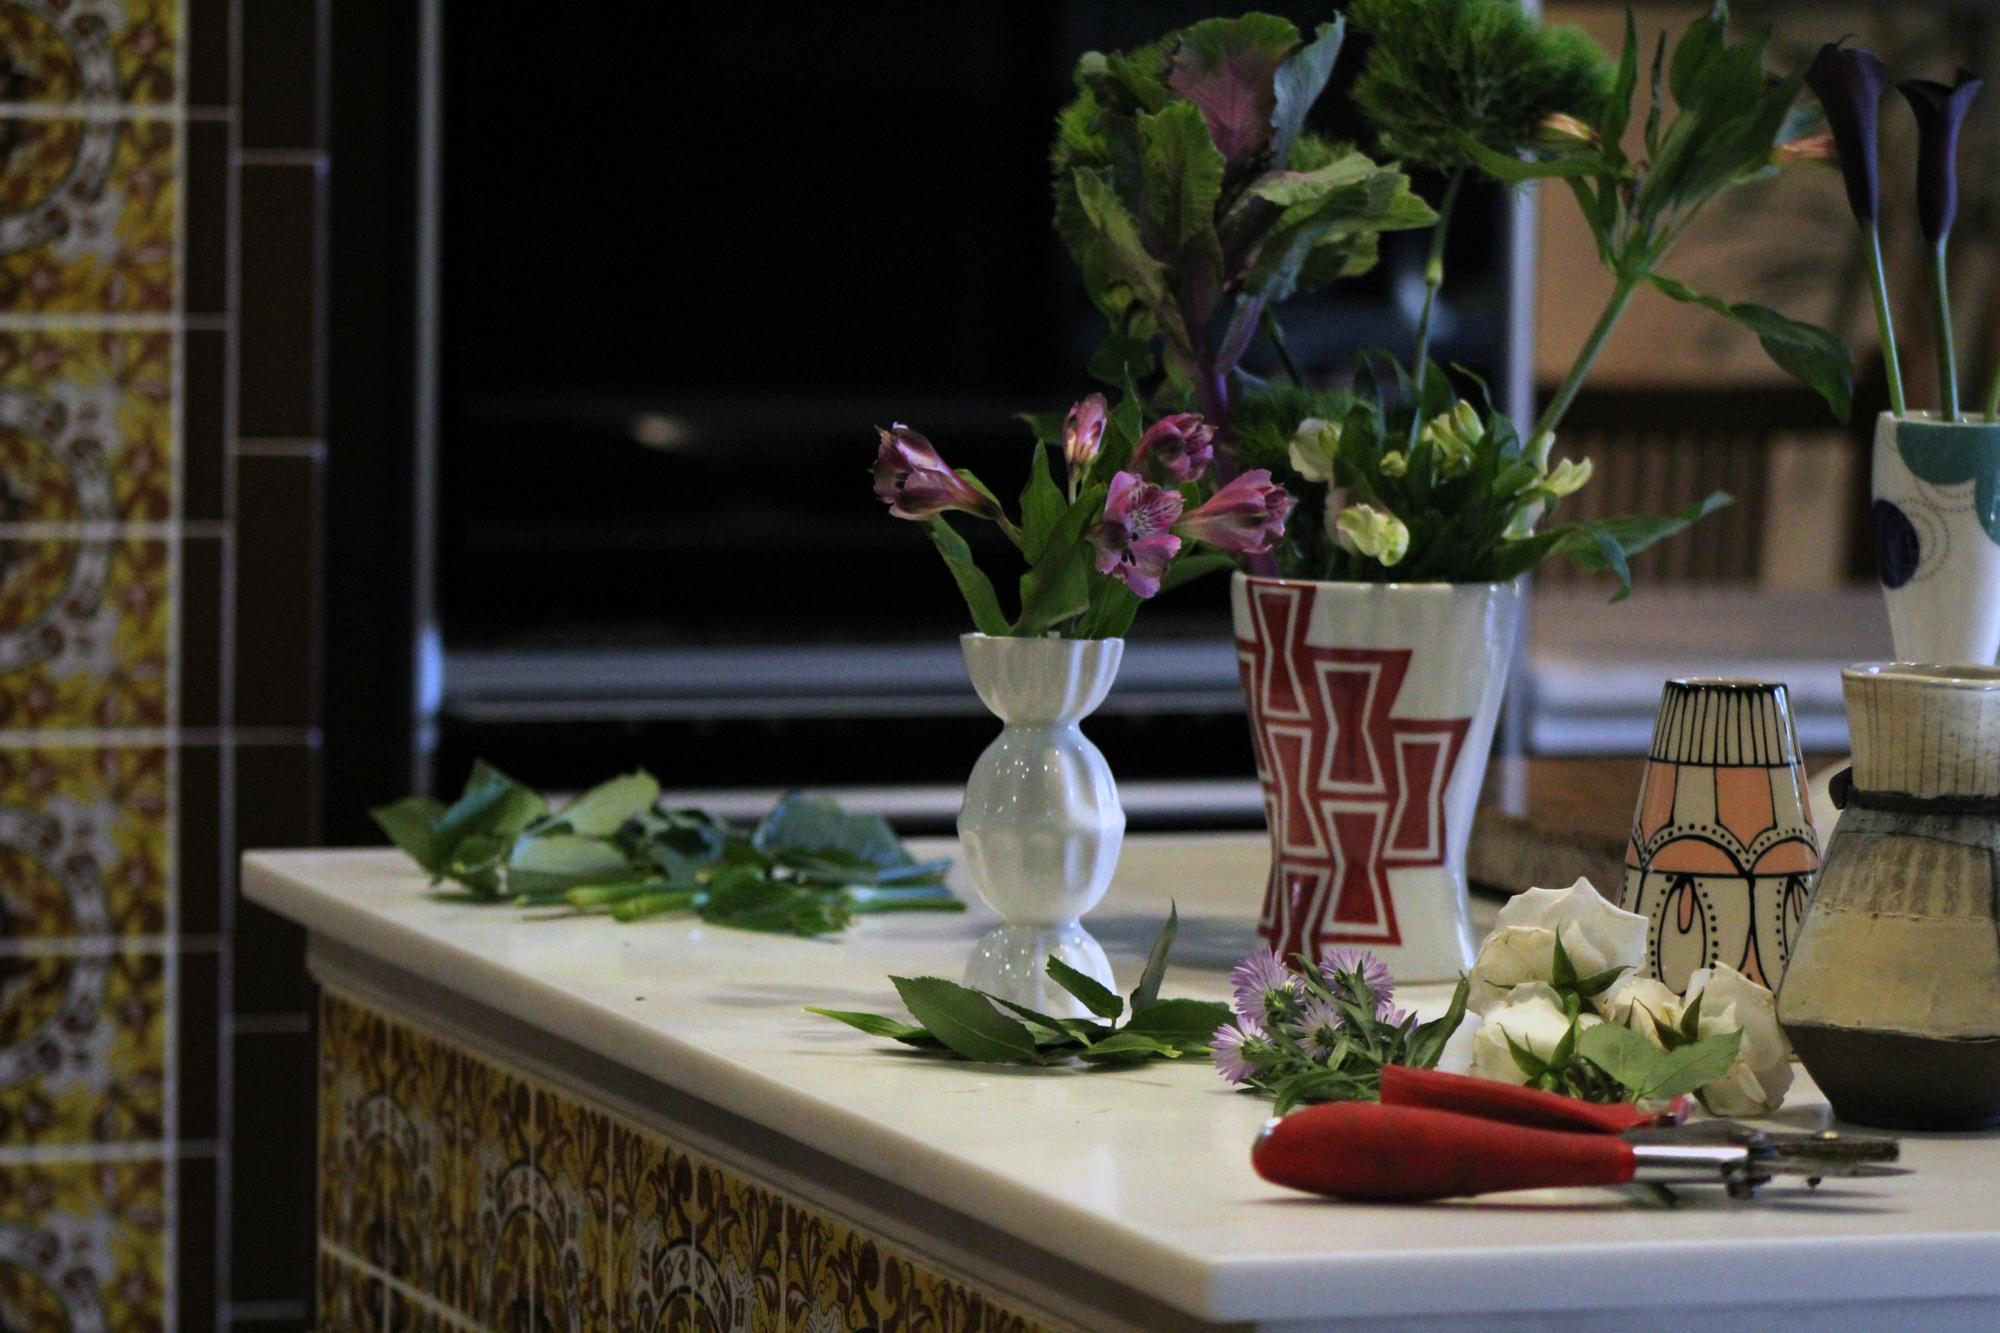 Bud Vase , 2017 Dan Altnether   Small Red Vase , 2017 Kelly Lynn Daniels   Pink Deco Vase , 2017 Rachel O'Flannagan   Small Vase , 2017 Mark Arnold